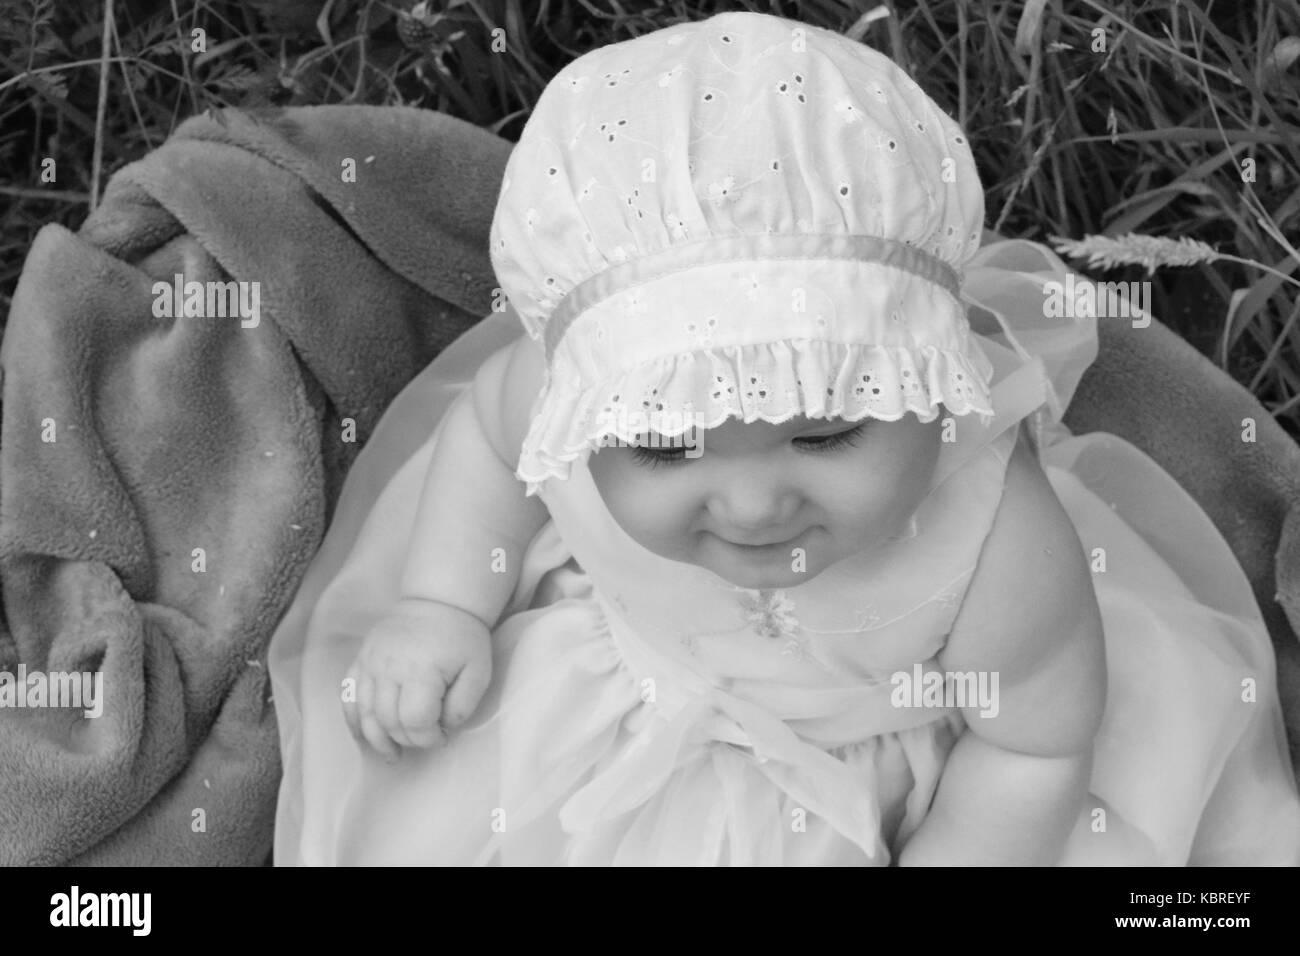 Baby Wearing Bonnet Photos   Baby Wearing Bonnet Images - Alamy 84eb2e59f88